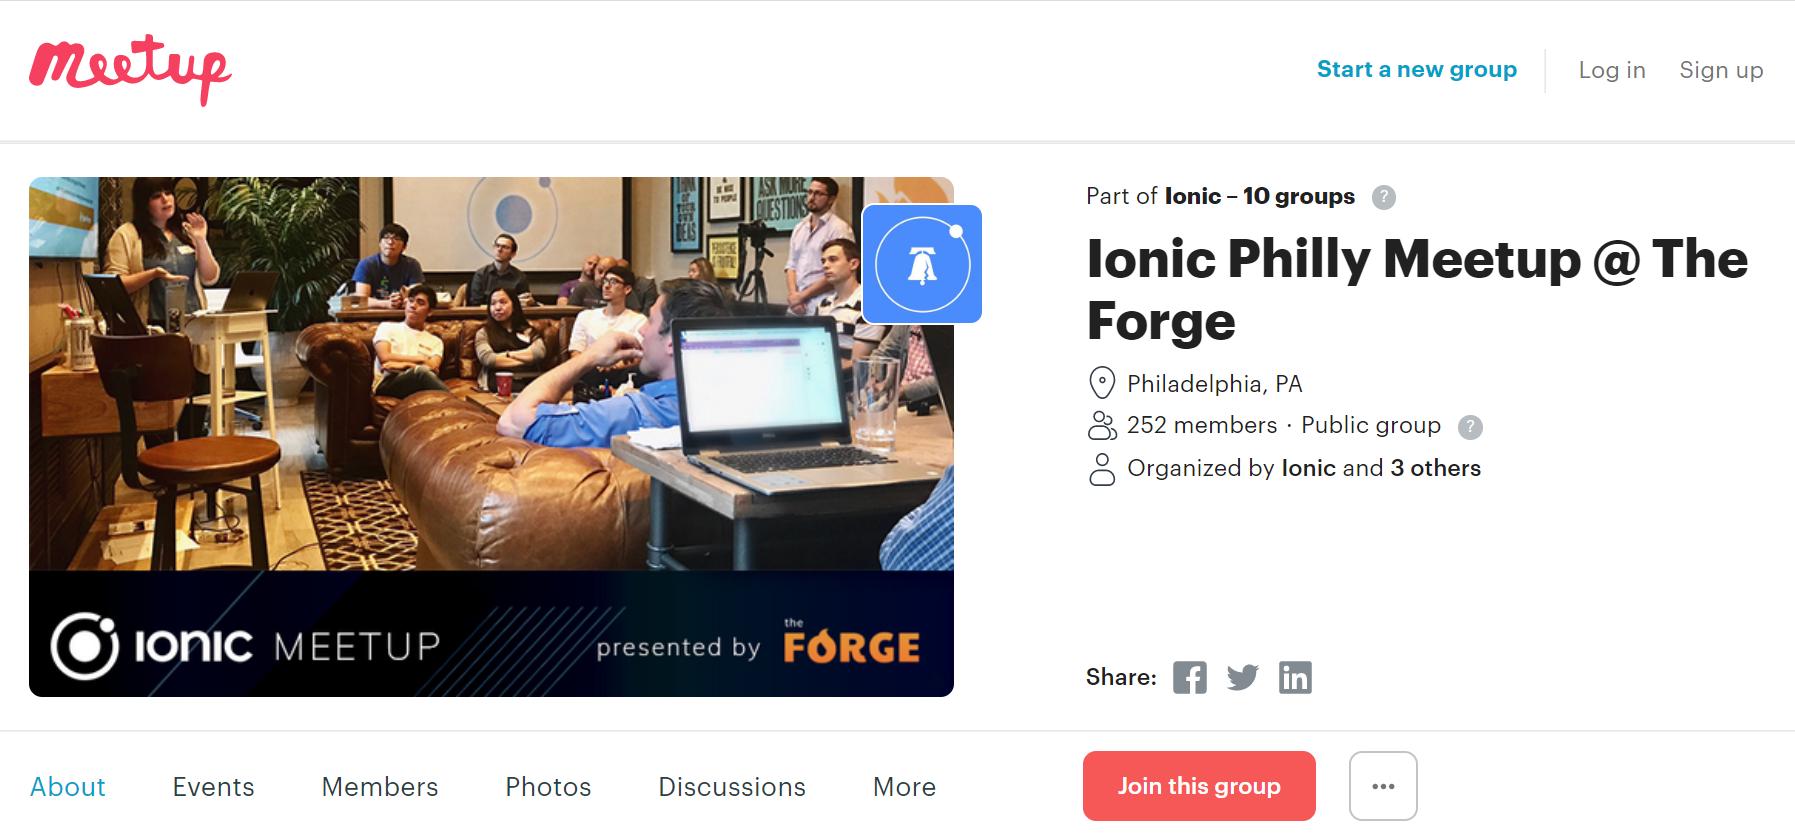 Top 10 Active Meetup Groups In Tech & Entrepreneurial Scene - Fig 4